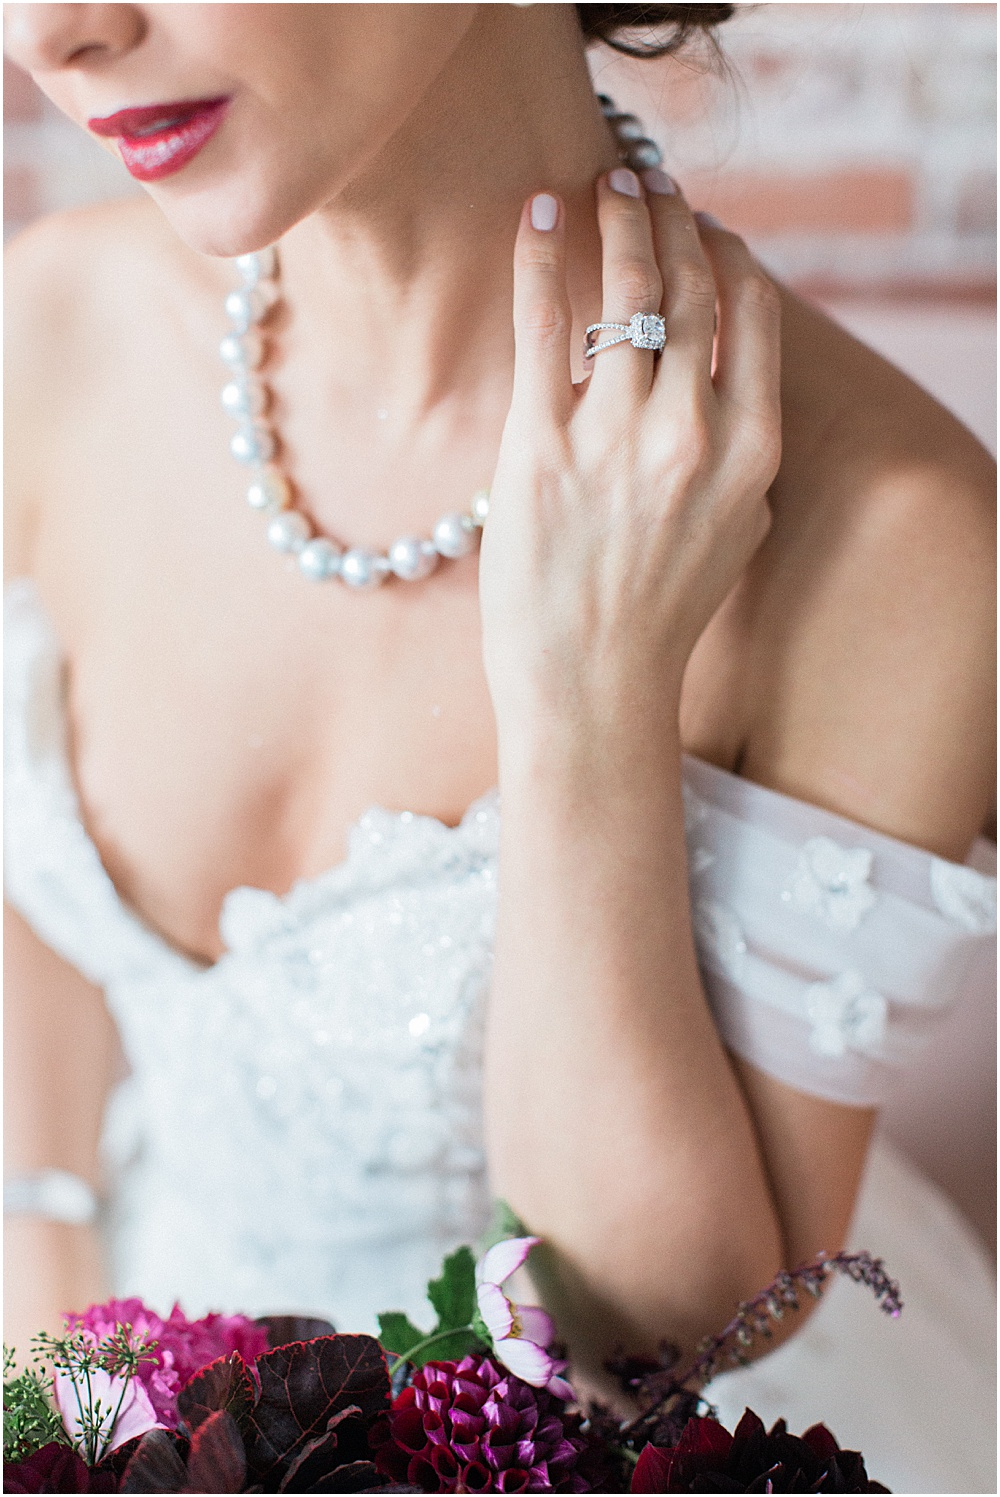 styled_shoot_fall_valentines_day_wedding_rhodi_island_ma_boston_wedding_photographyer_meredith_jane_photography_photo_0037.jpg